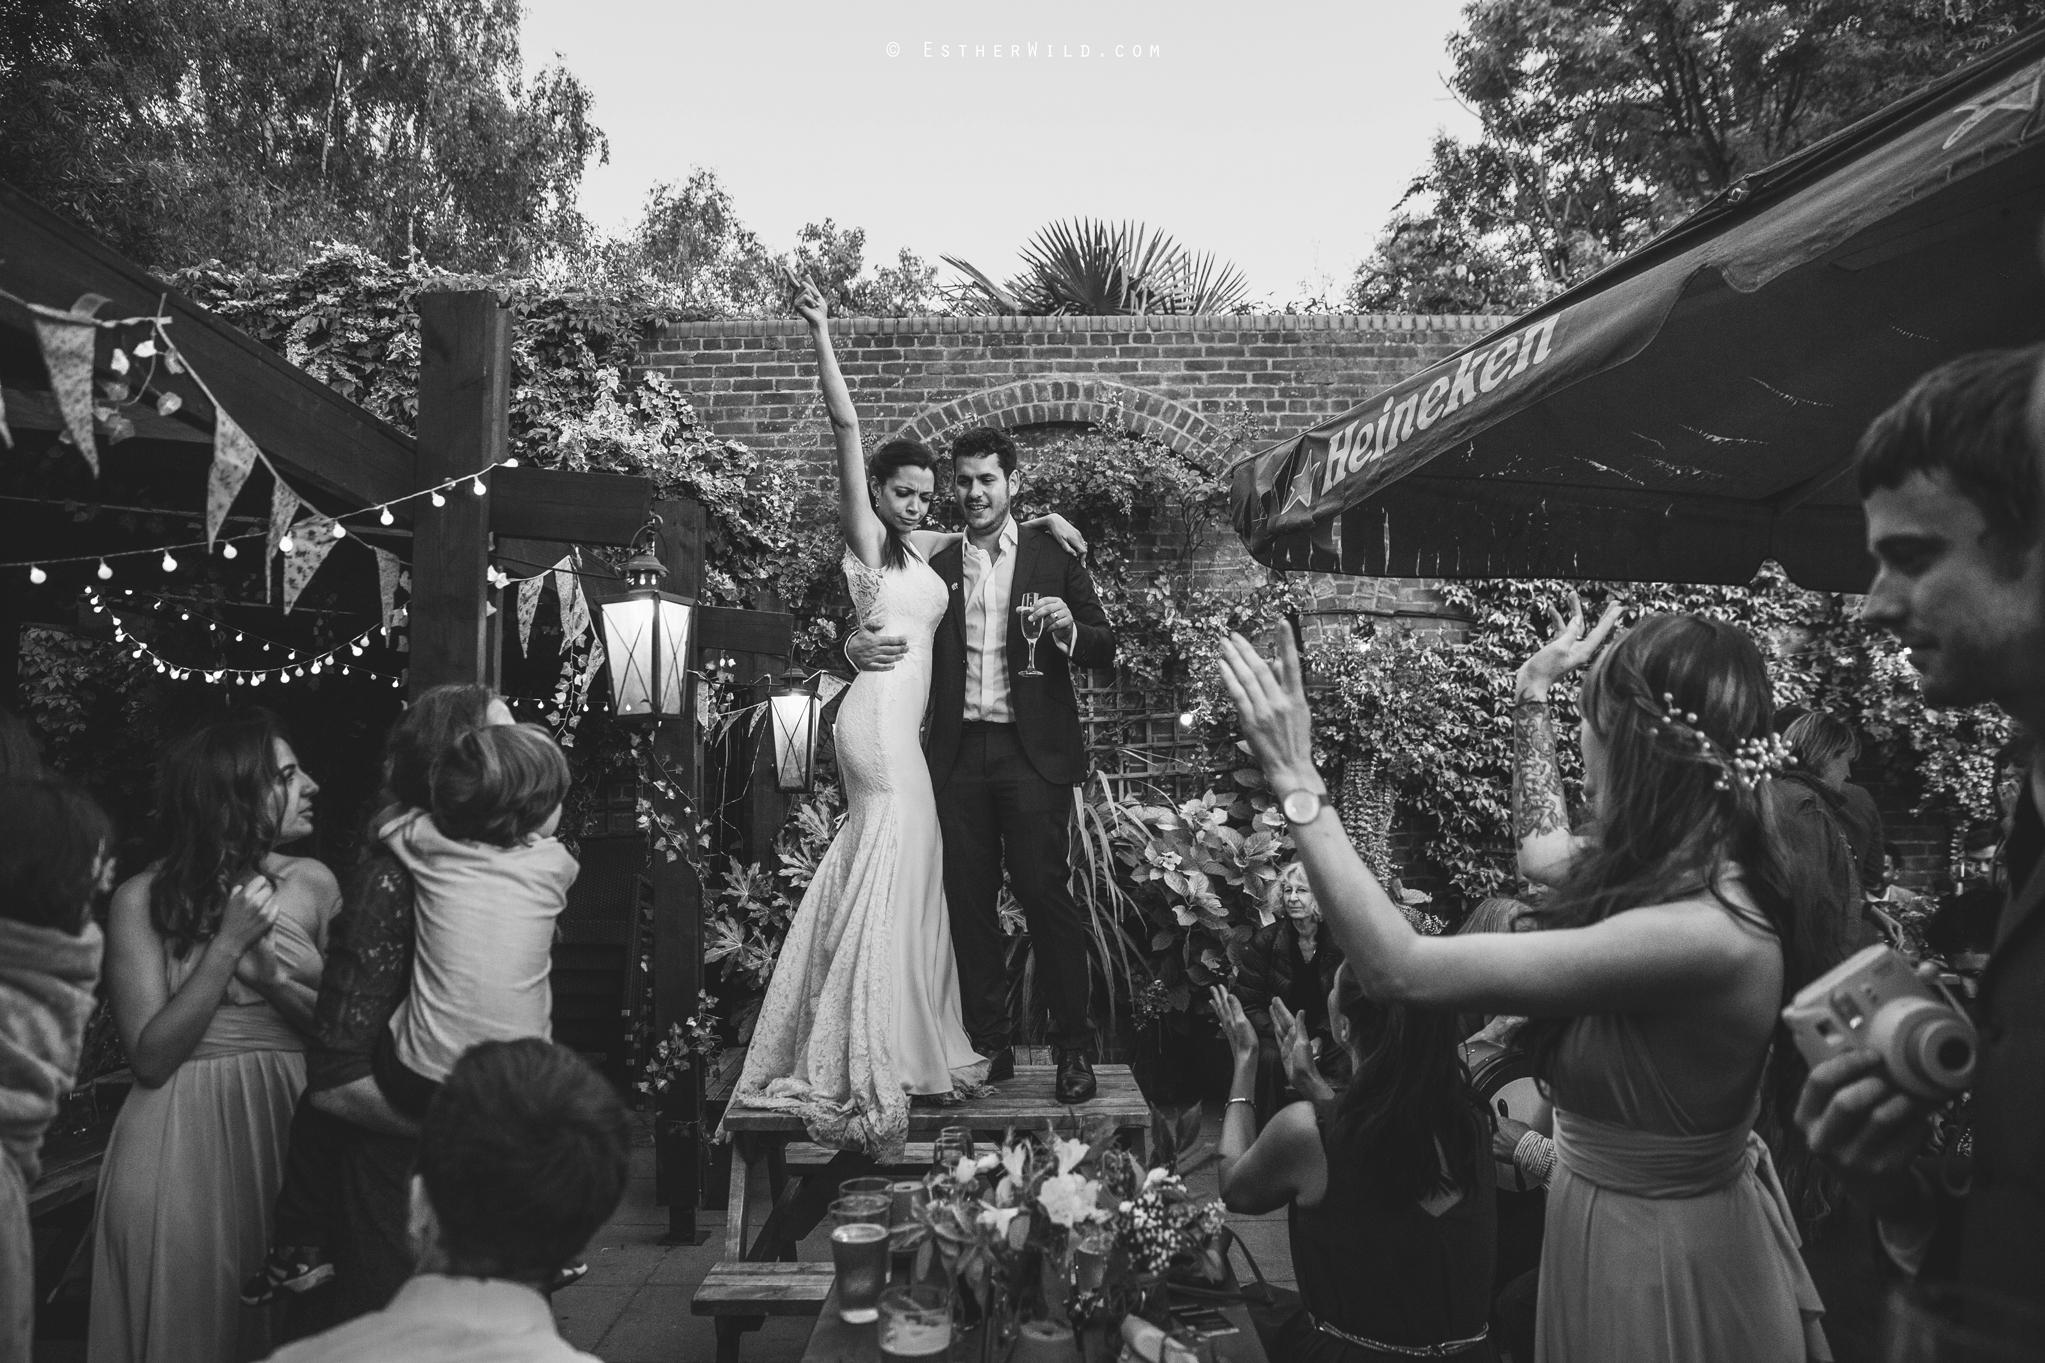 0917_London_Camden_Islington_Bus_Vintage_Wedding_Esther_Wild_IMG_7837-1.jpg